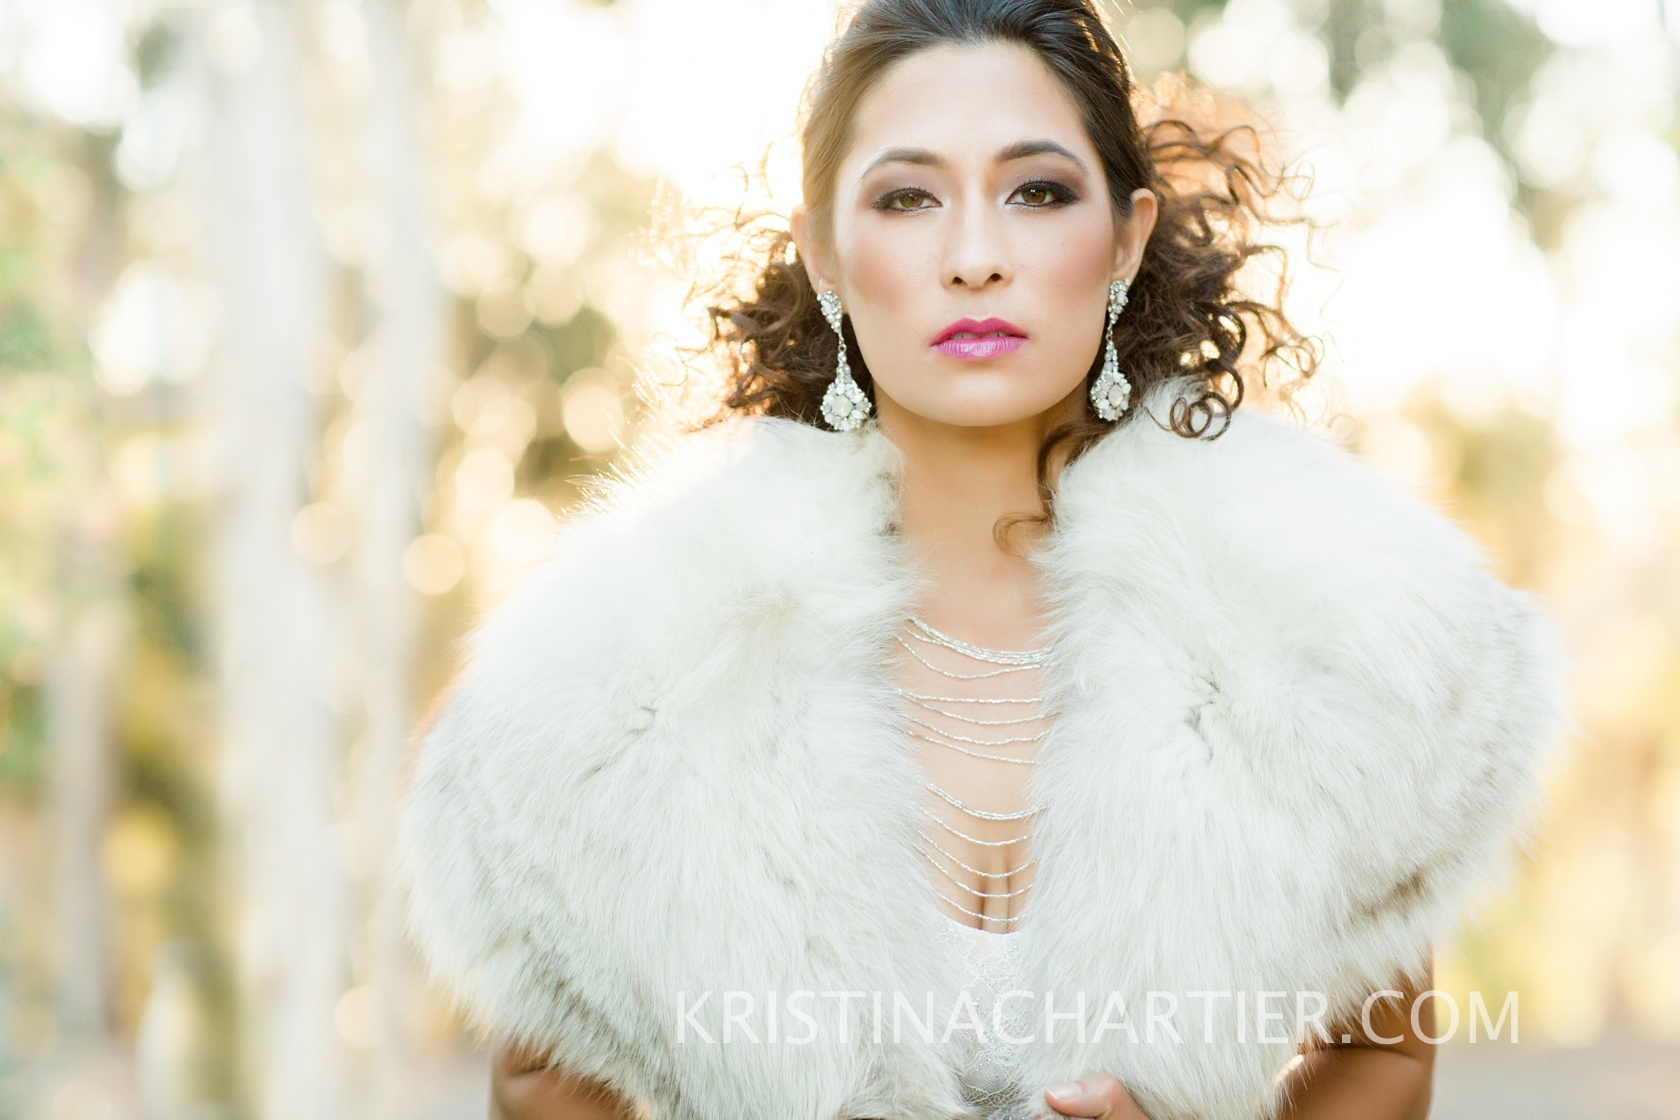 Photography by Kristina Chartier | Styling by Jennifer J. Petrini